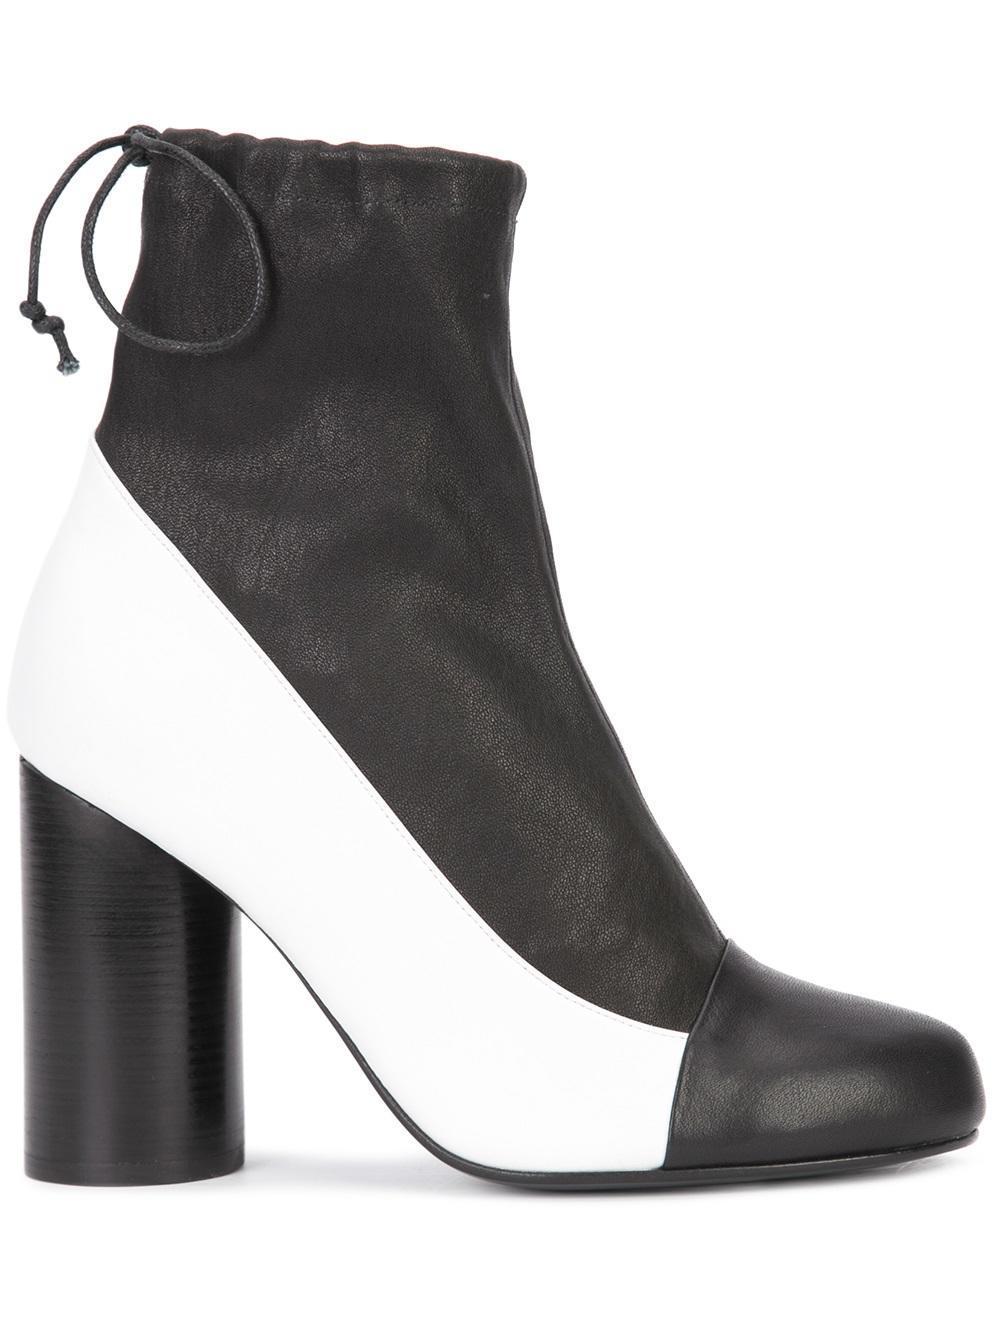 Valas Cylinder Heel Boots In Black Lyst